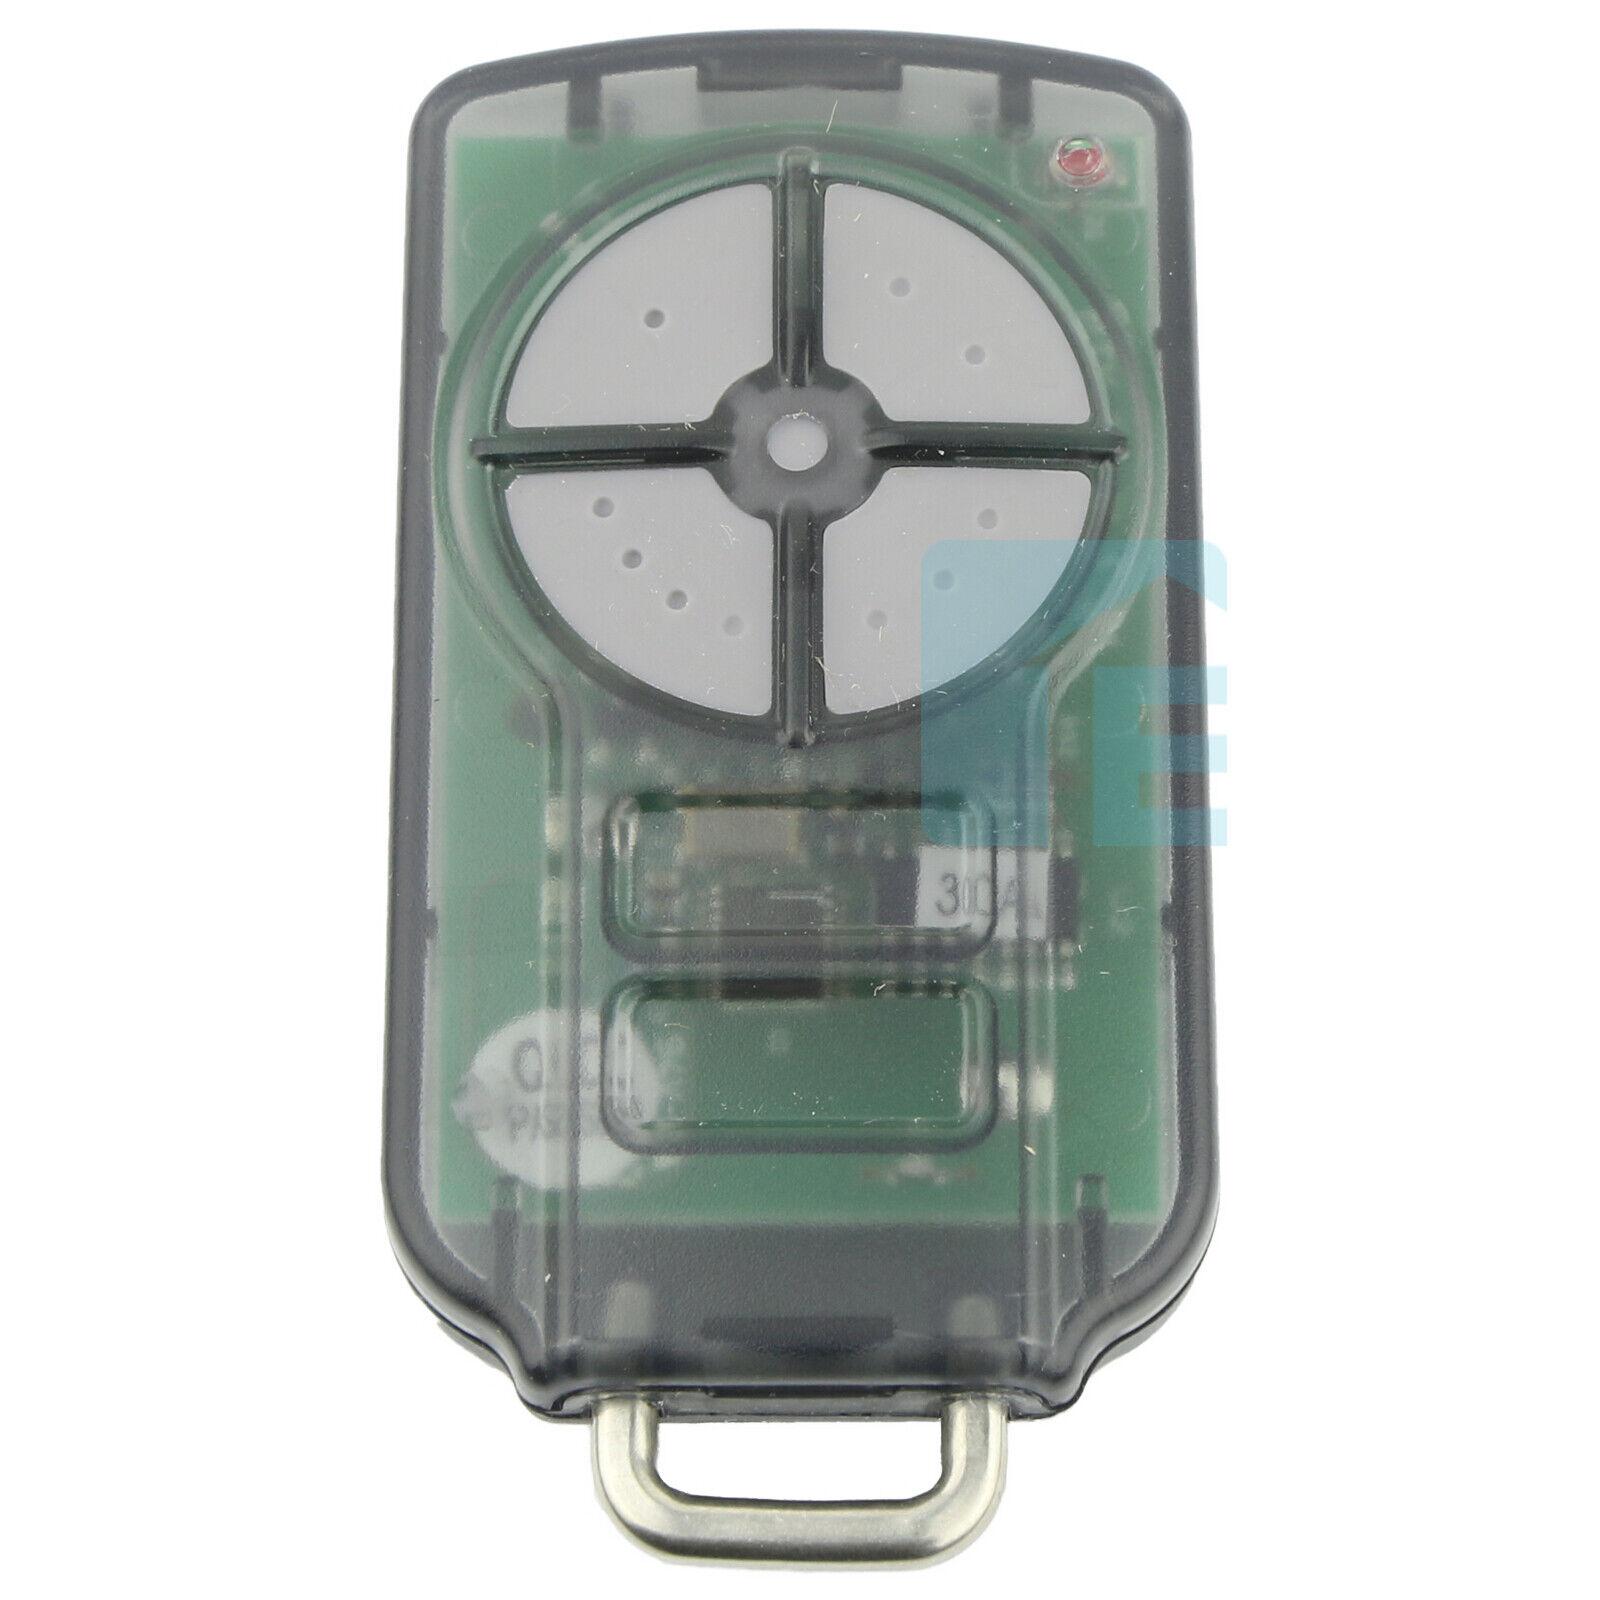 Gdo6v4 Garage Door Remote Transmitter Ptx5v2 Ata Ptx5